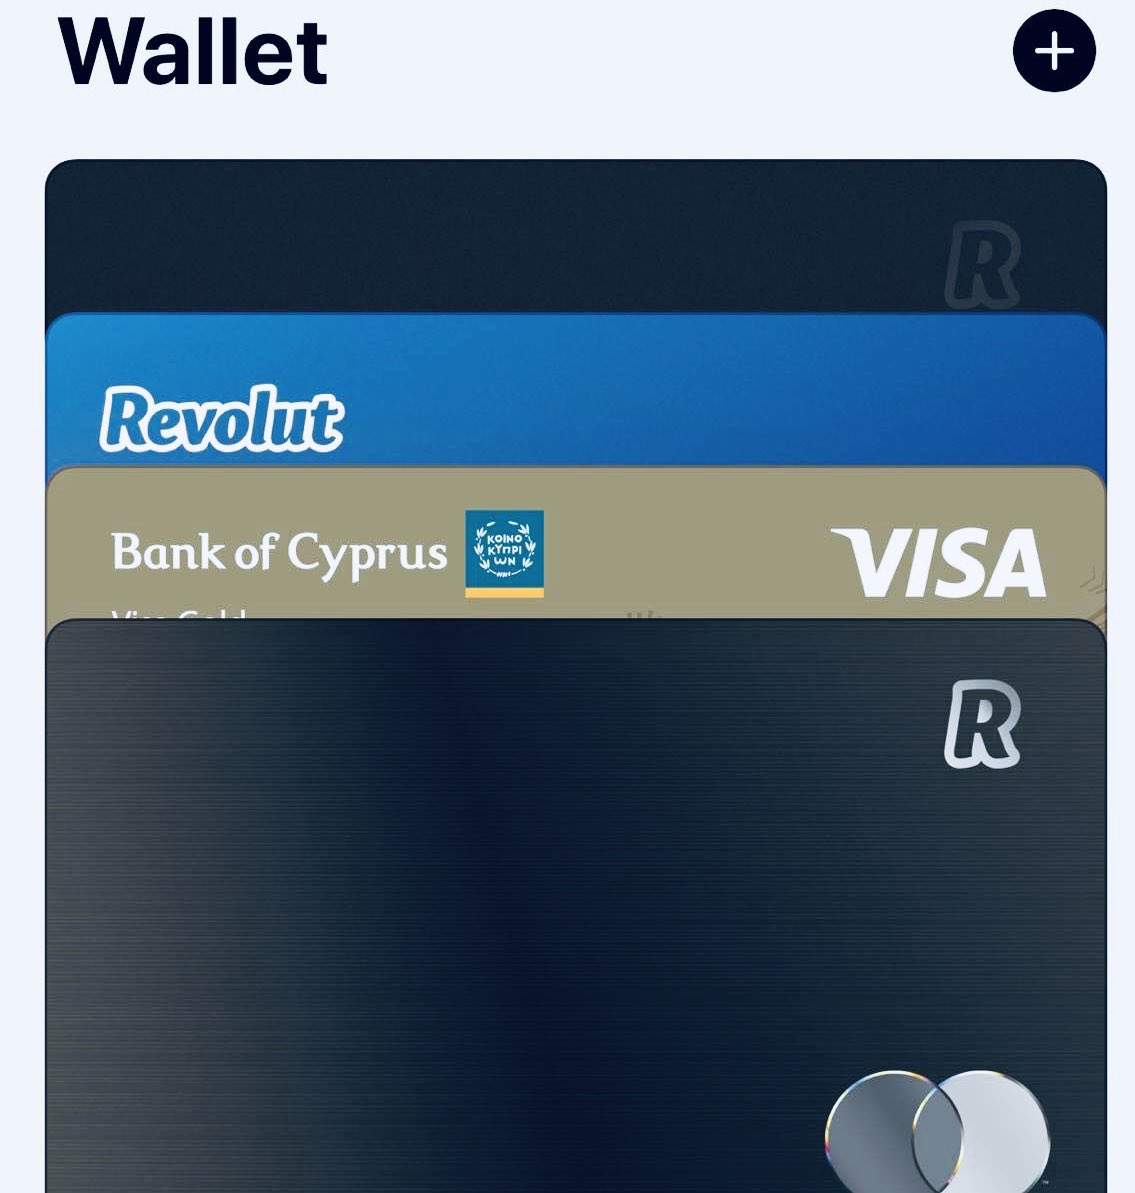 Great News #Now #Cyprus @RevolutApp & @bankofcyprus + ApplePay=❤️ well done 👍